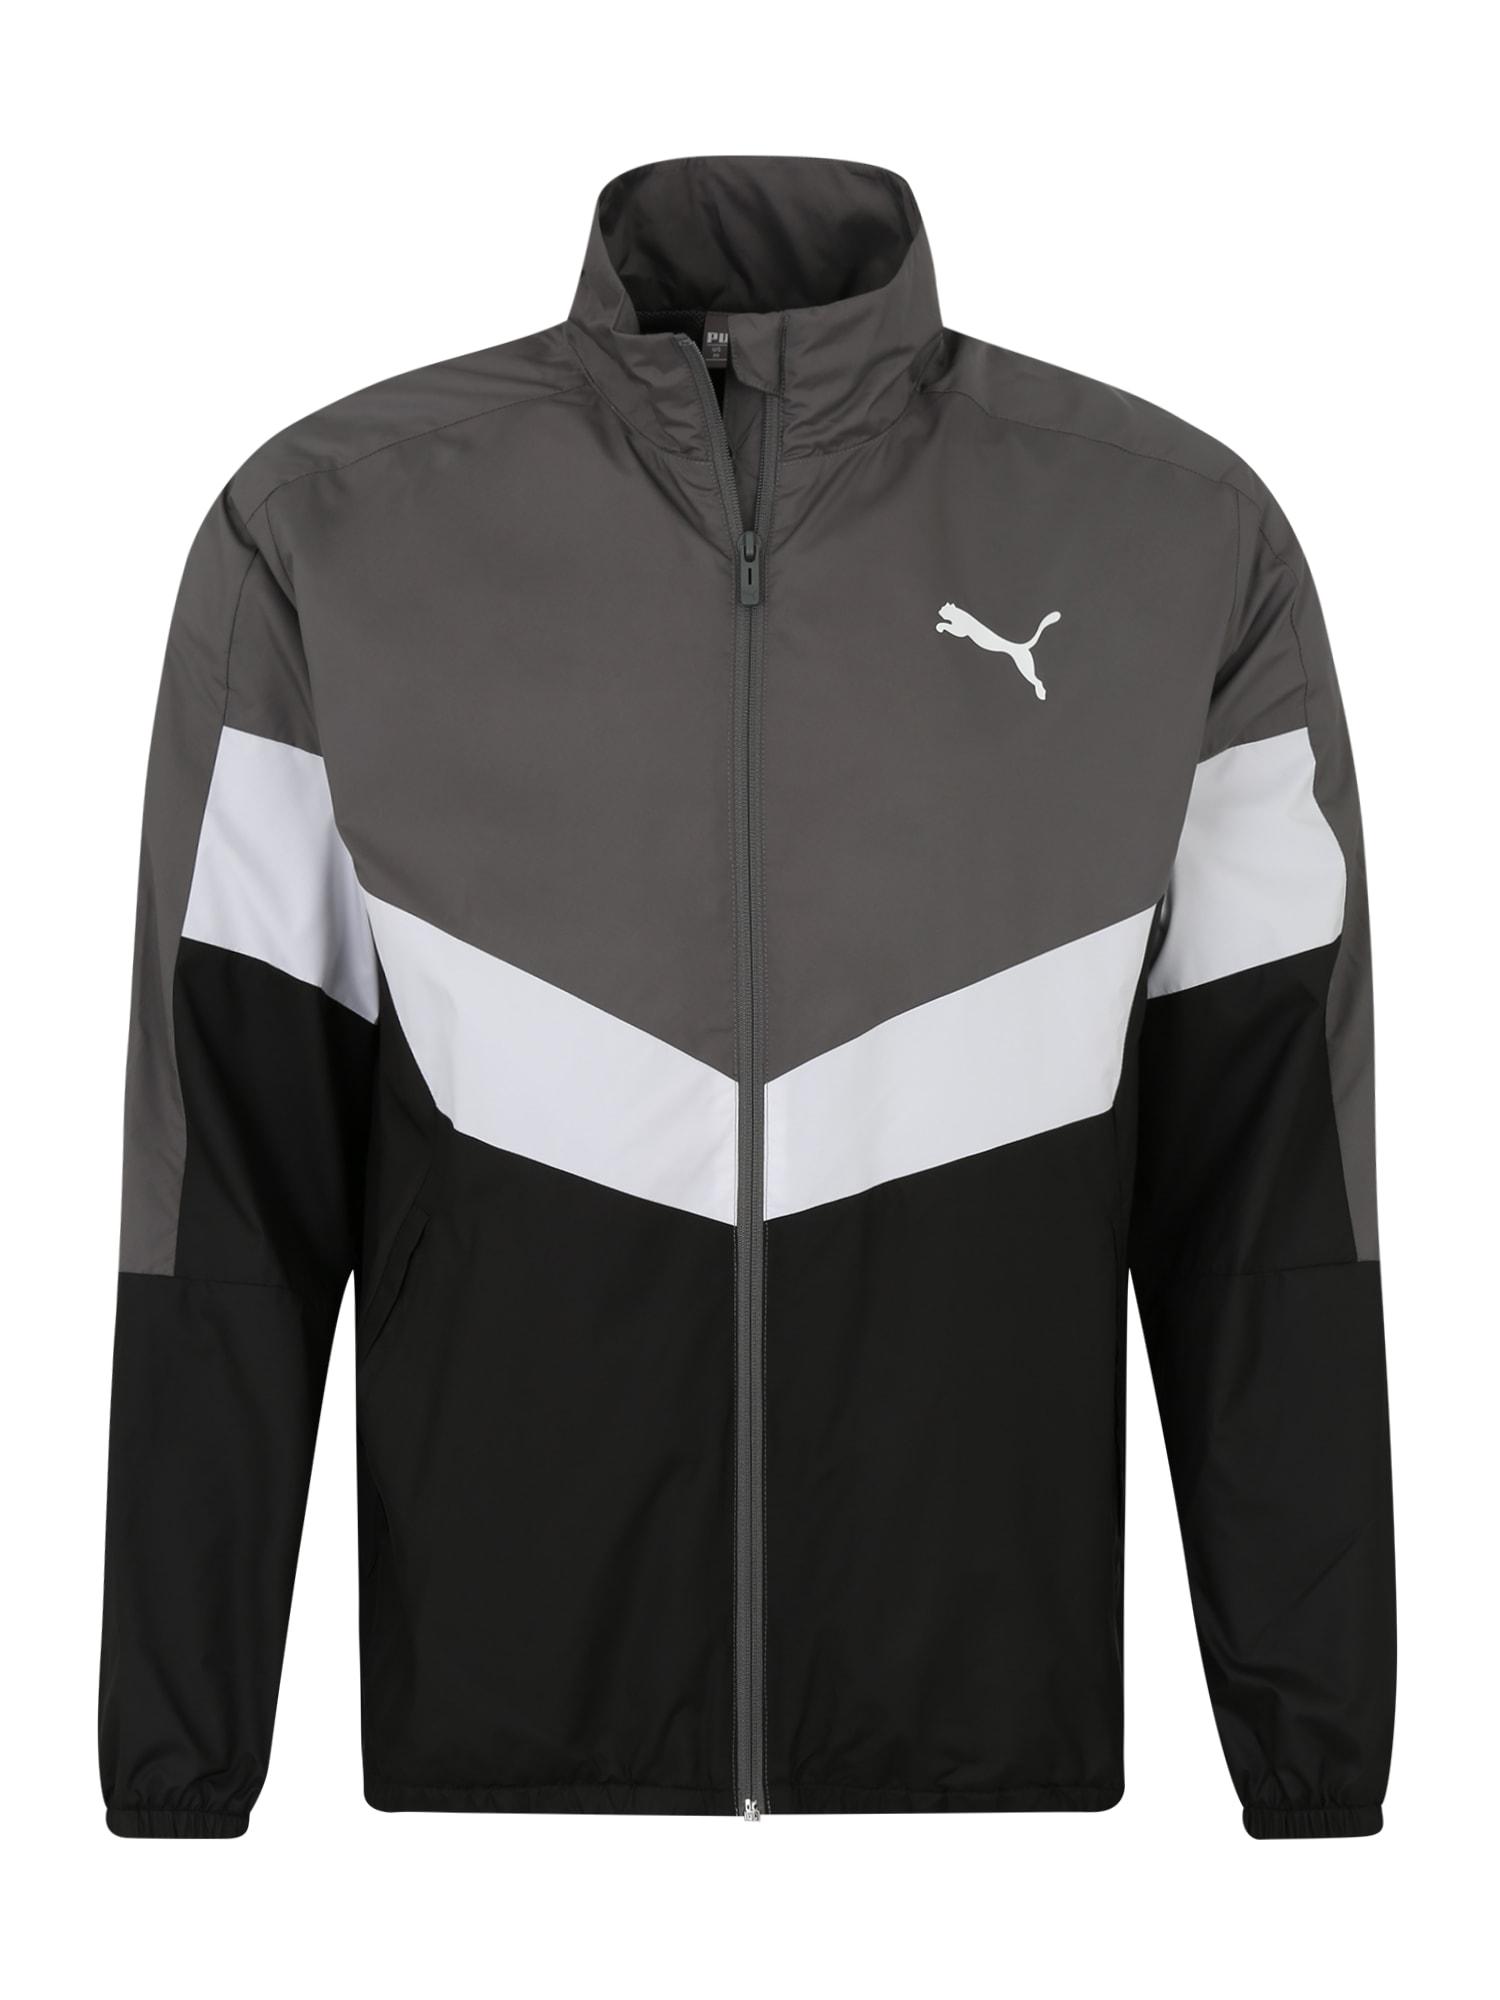 PUMA Športová bunda 'CB Windbreaker'  čierna / sivá / biela